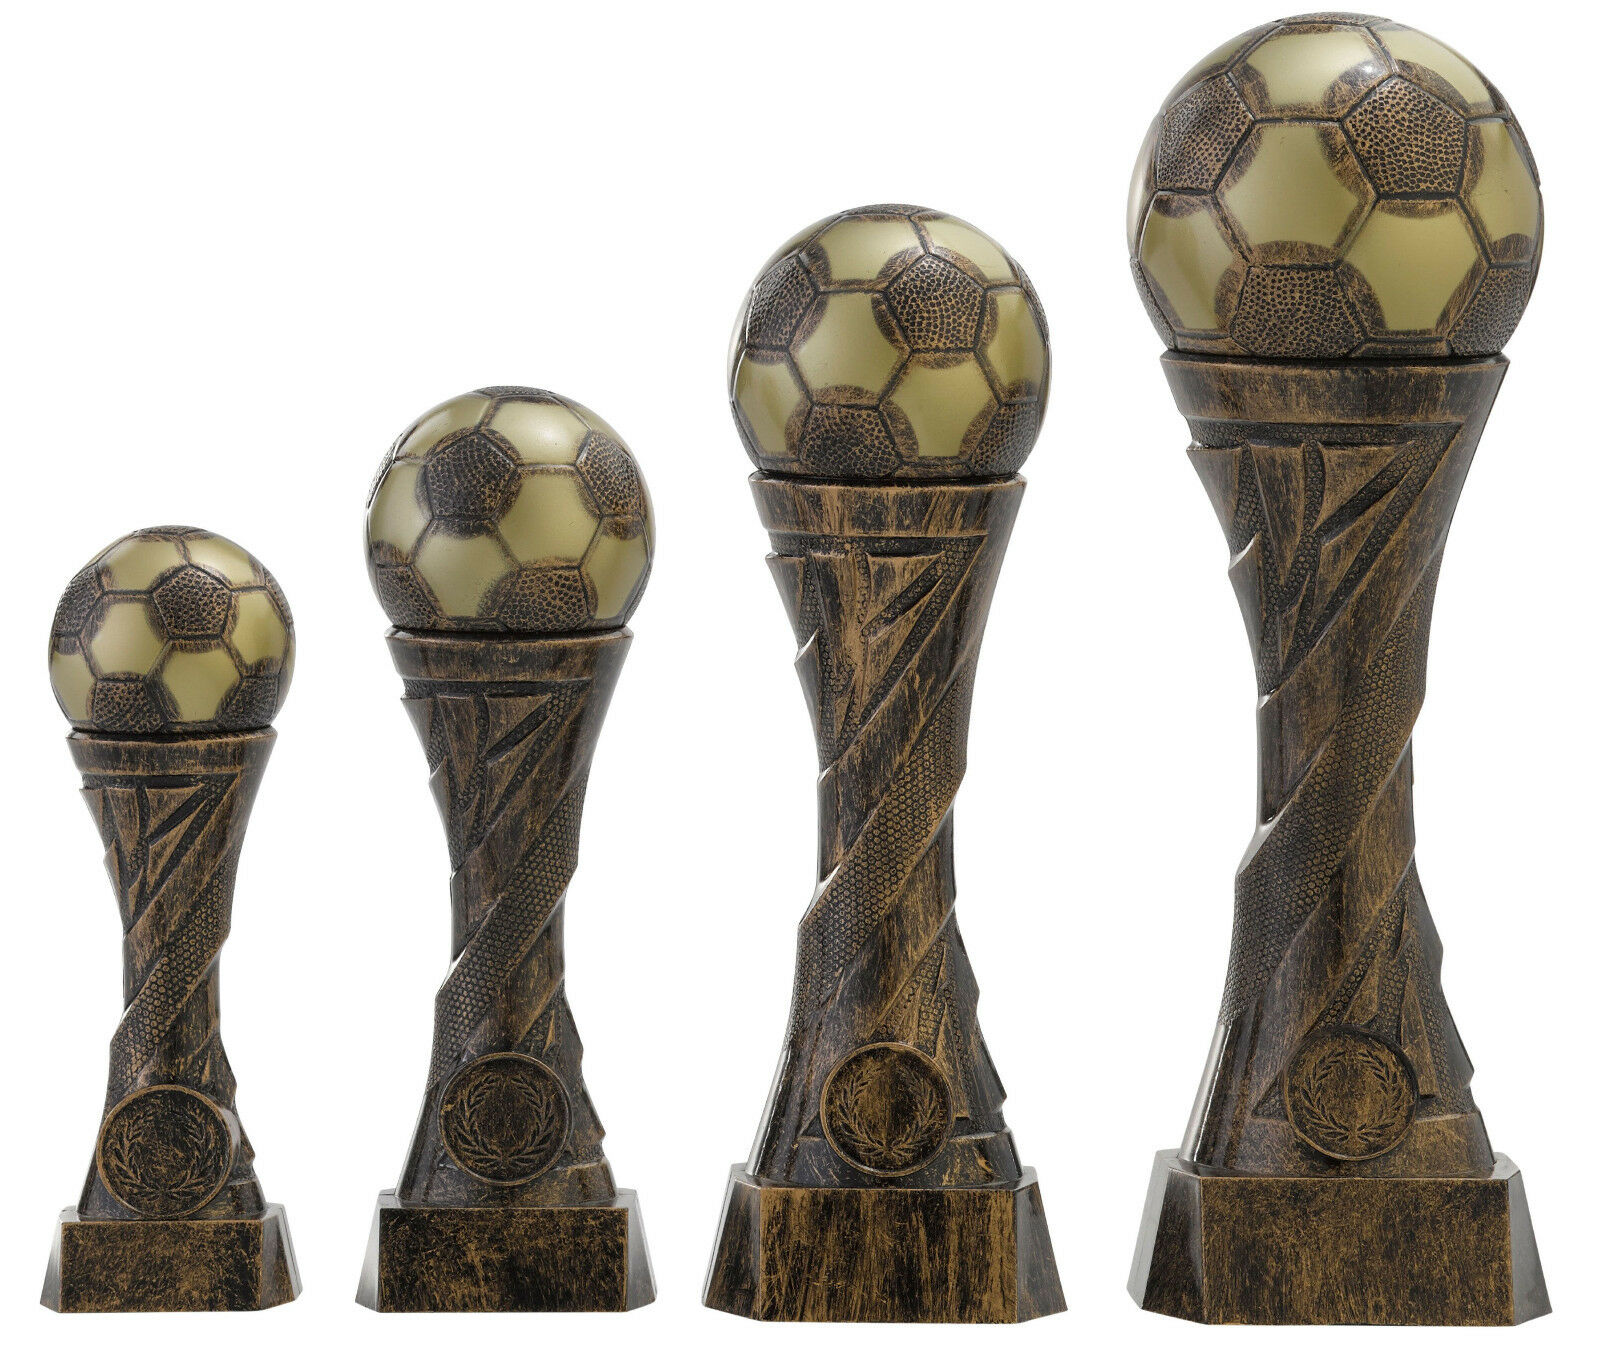 Fußball Ball Pokale Pokale Pokale 8er Serie Kinder Trophäe Figur Pokal Turnier mit Gravur c162 d47928